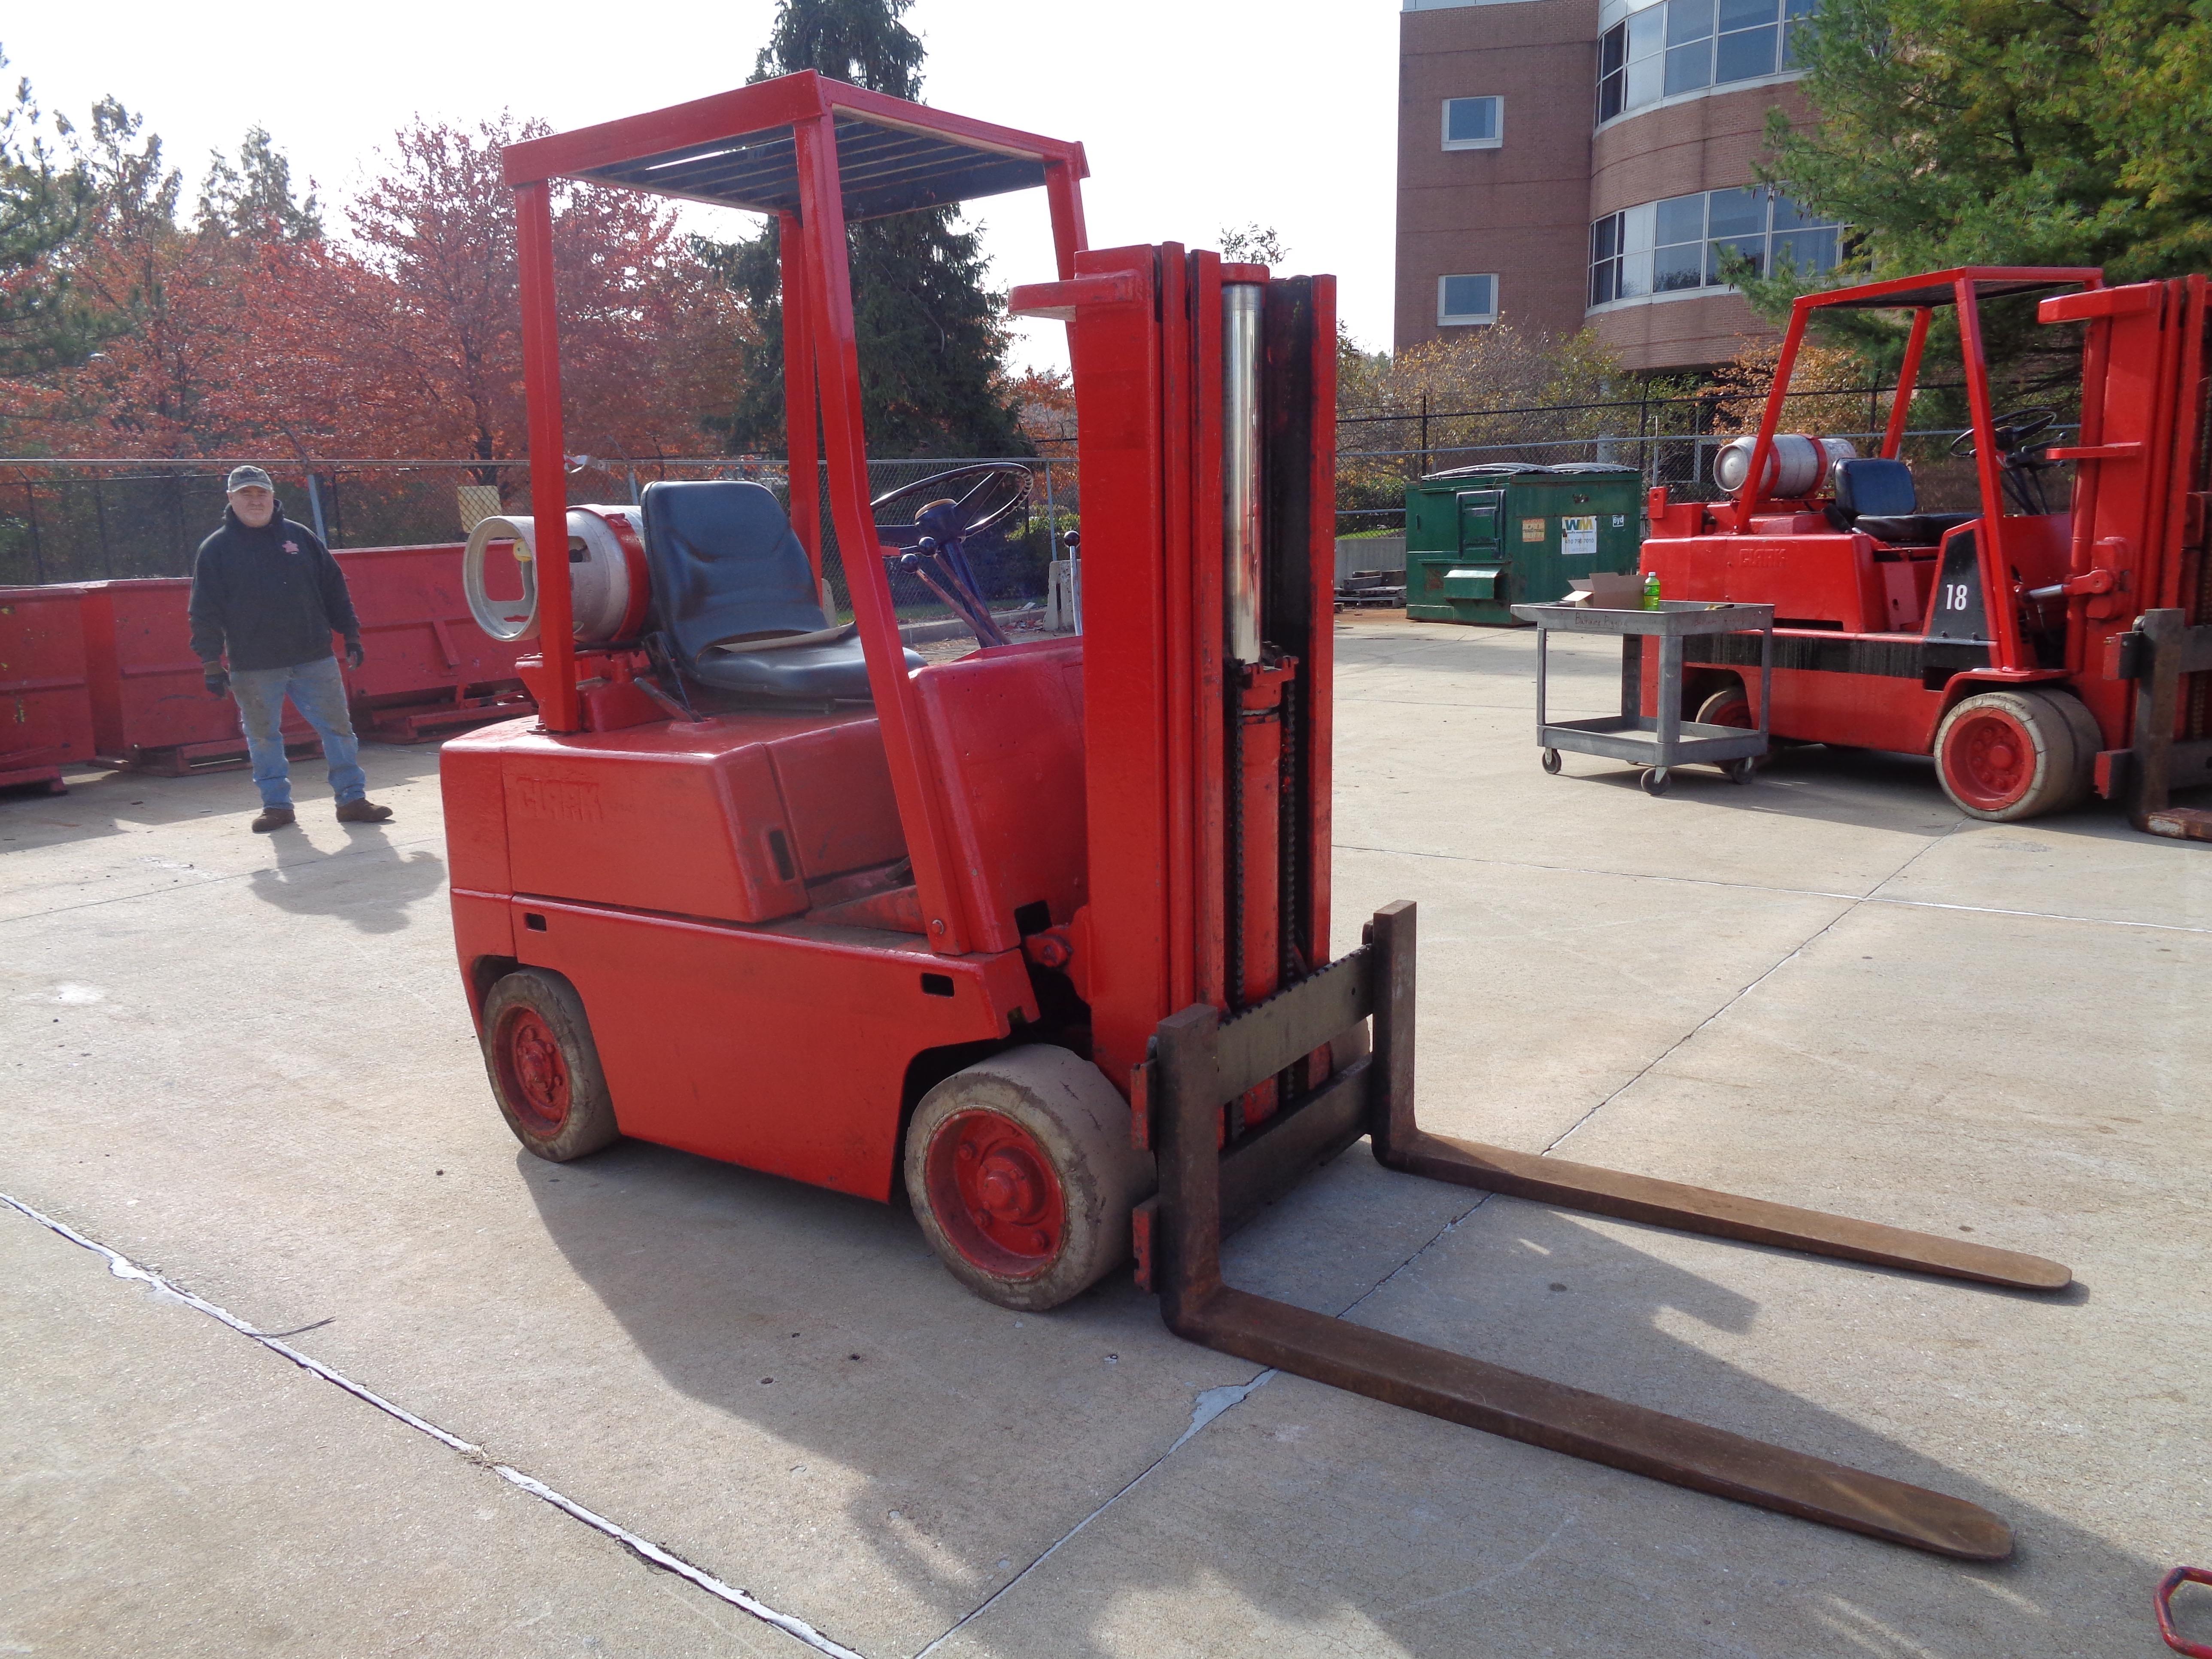 Clark C500-45 Forklift- 4,500 lbs - Image 9 of 10